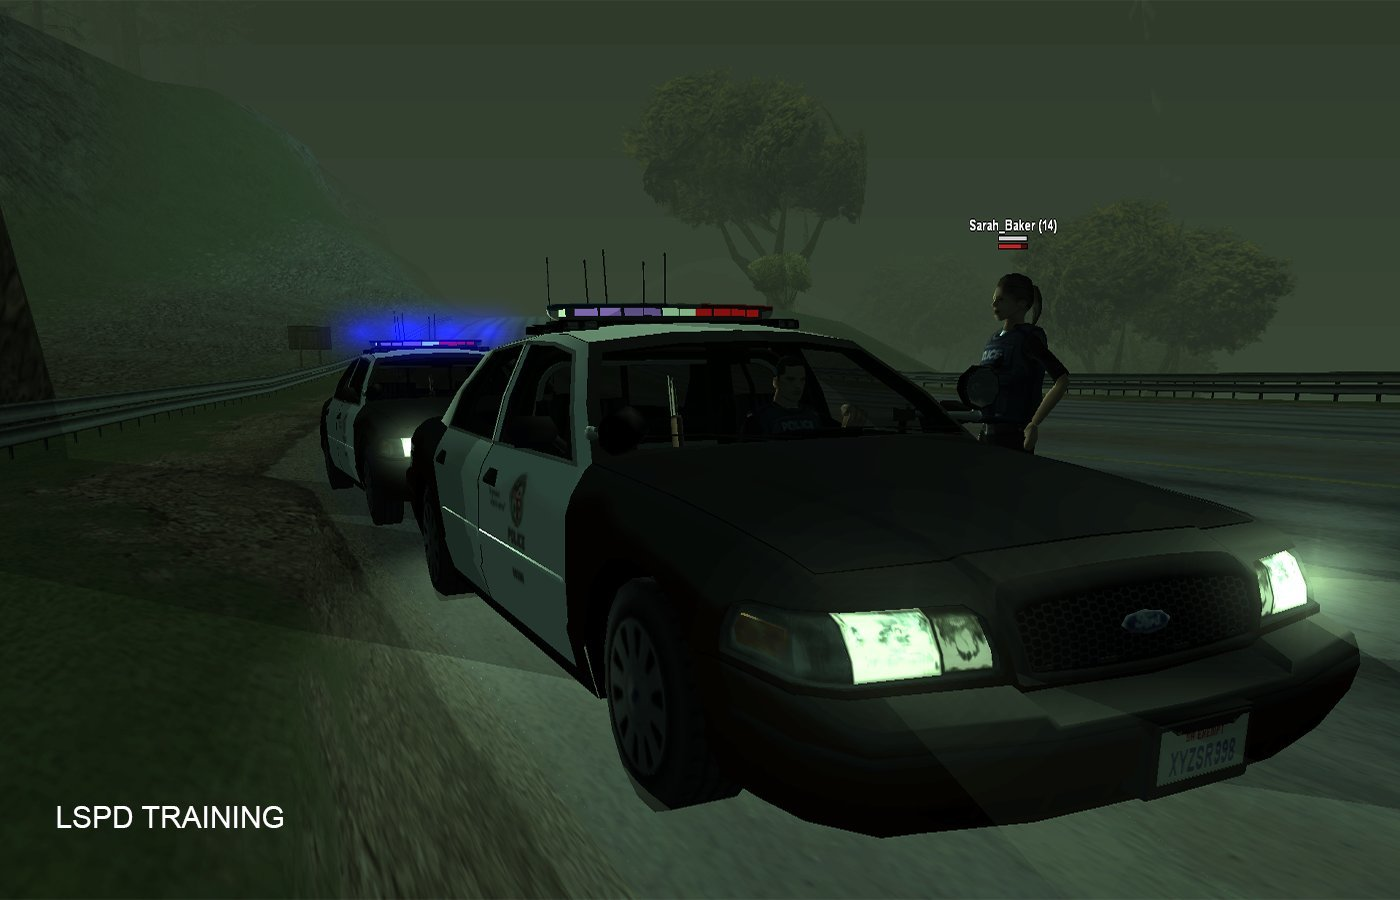 Los Santos Police Département #toprotectandtoserve (Part VI) - Page 3 1604446486-screen6